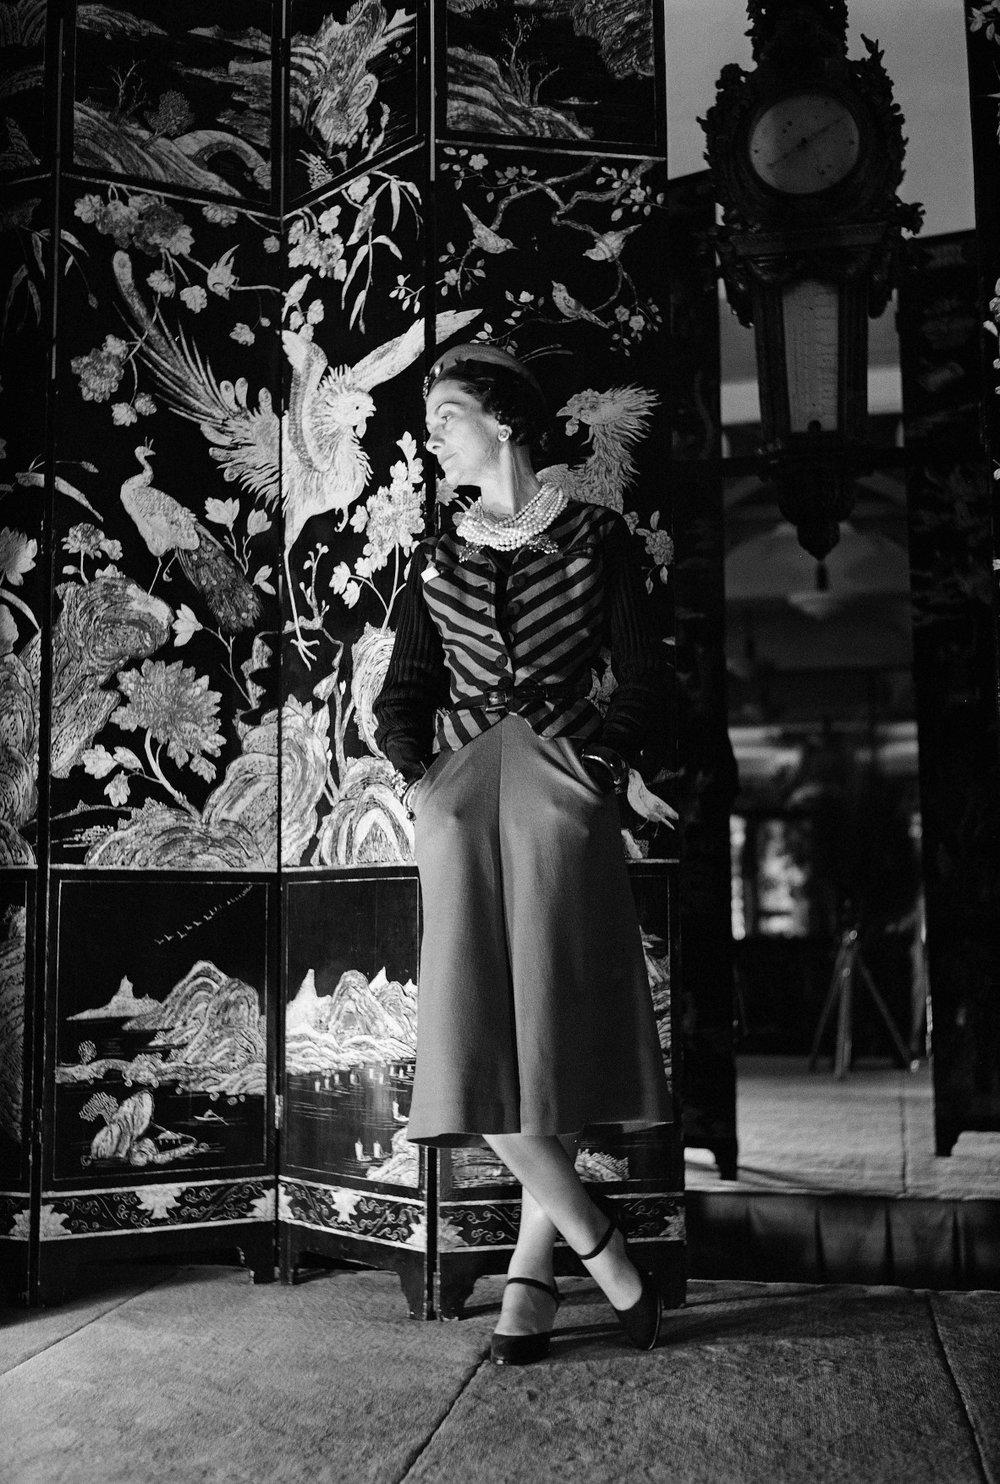 Coco Chanel and her Coromandel screens